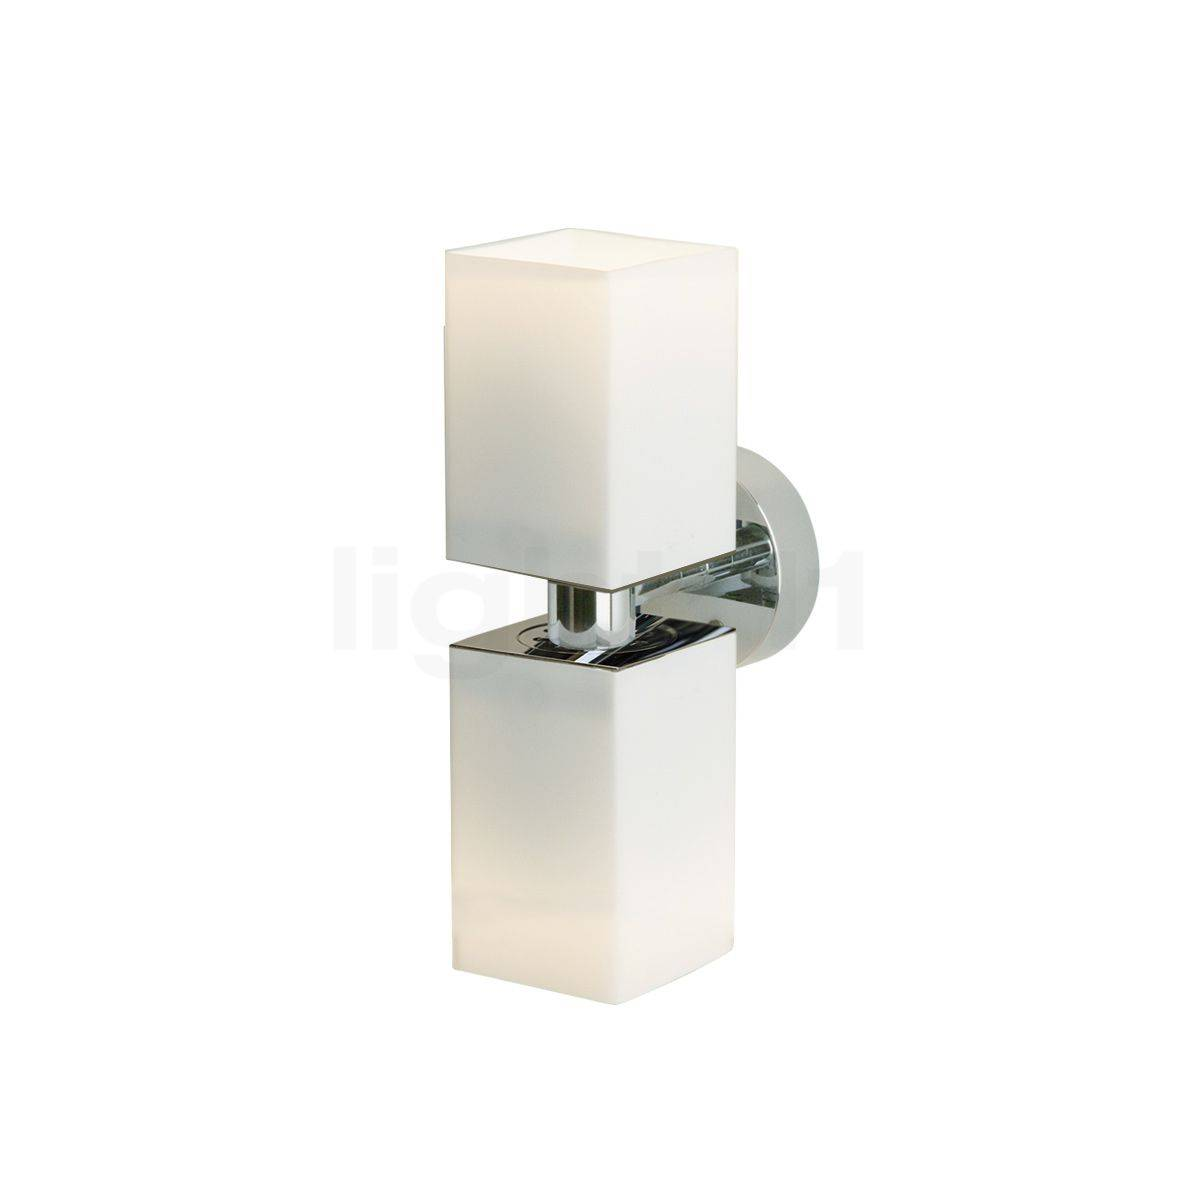 Top Light Cube mini Applique murale 2 foyers, chrome brillant